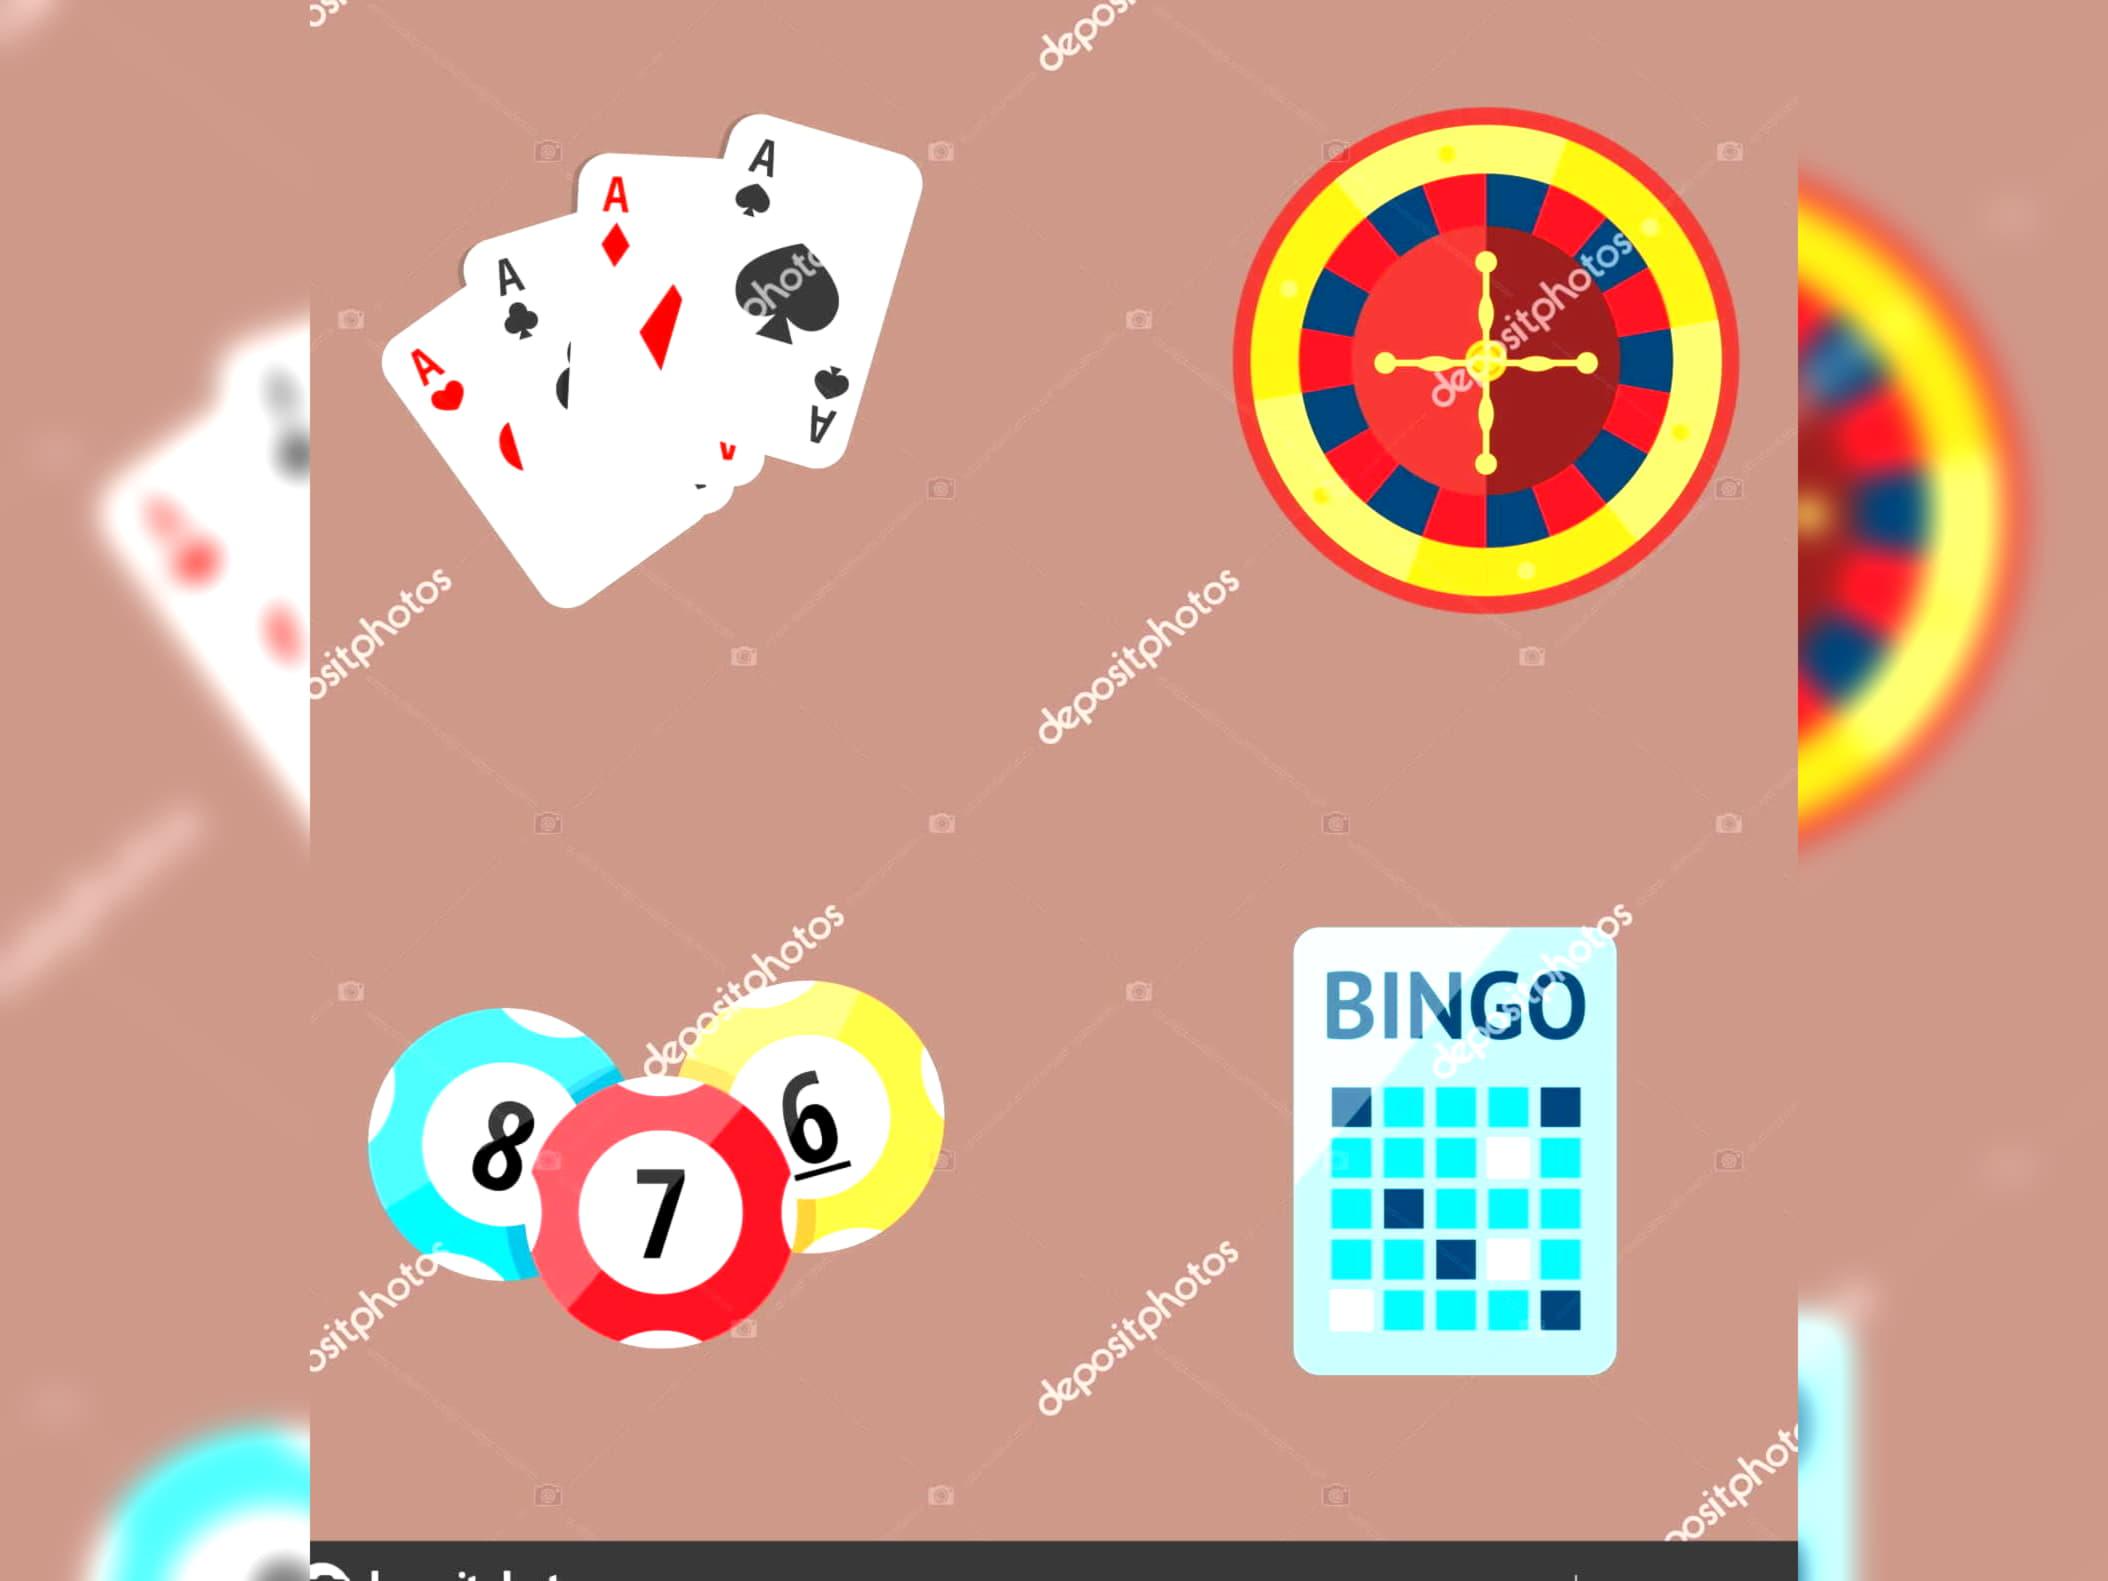 €33 Mobile freeroll slot tournament at CoolCat Casino